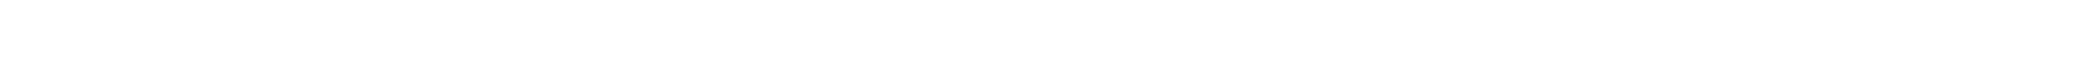 jardiservice-erba-bianca